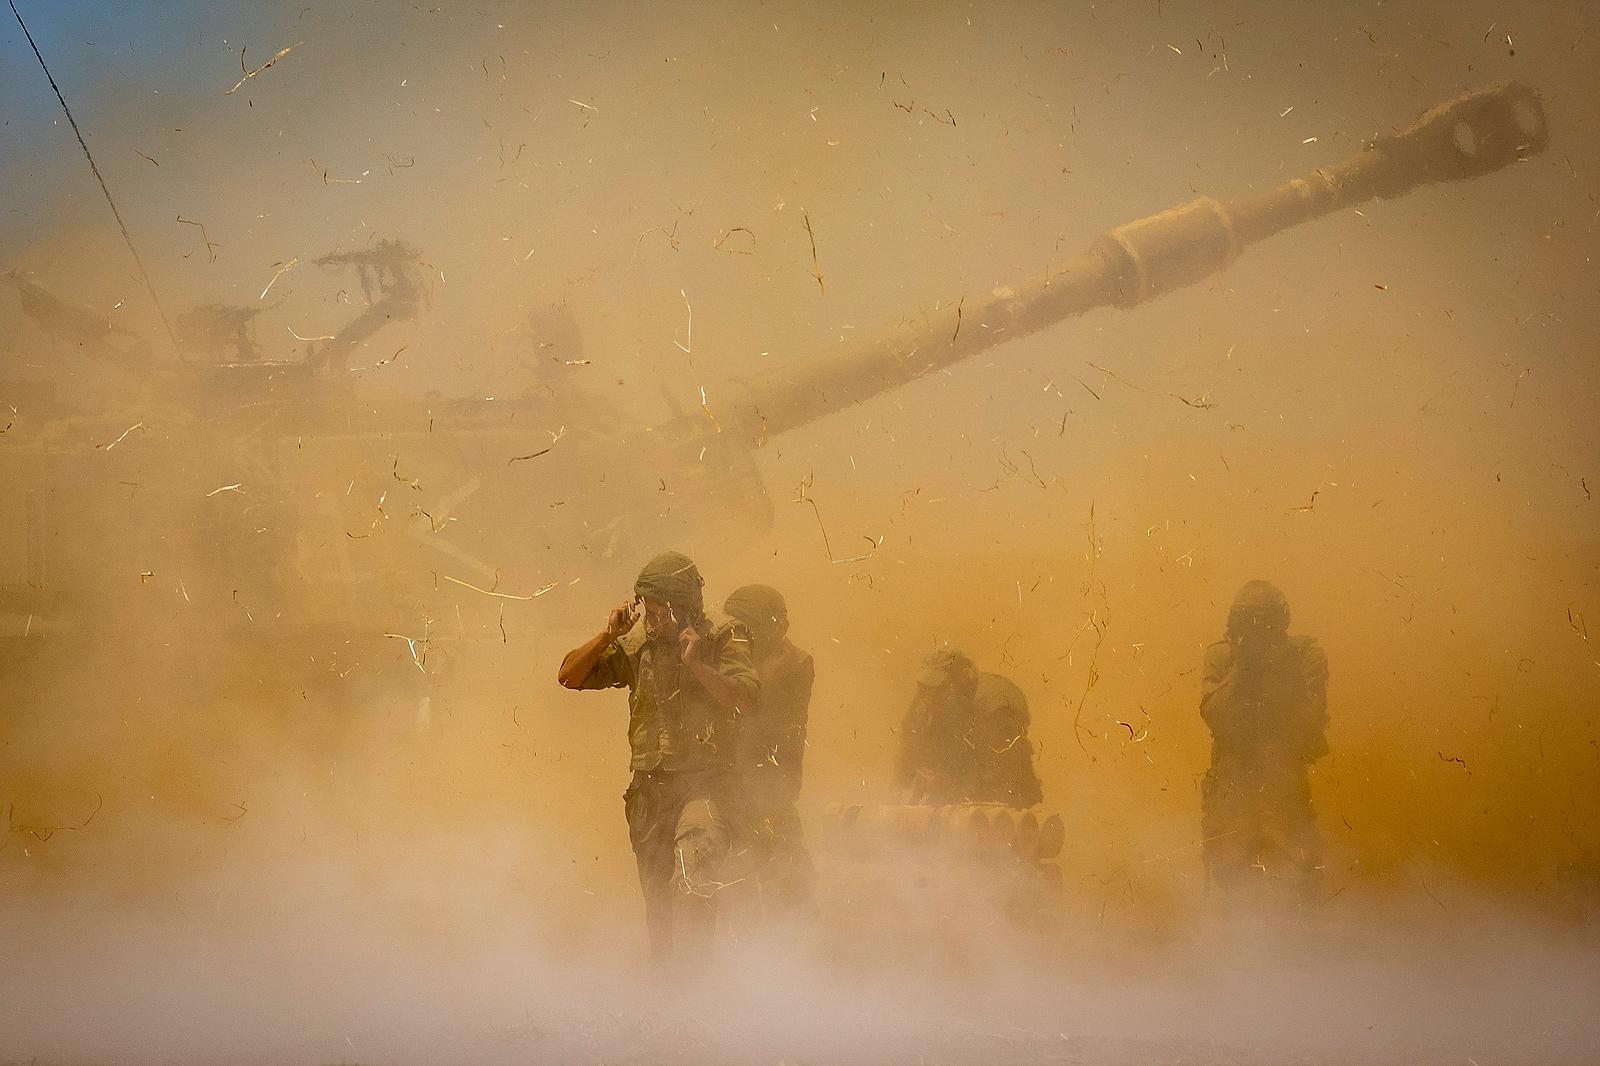 An Israeli artillery unit fires toward targets in Gaza Strip, at the Israeli Gaza border, Wednesday, May 12, 2021. AP